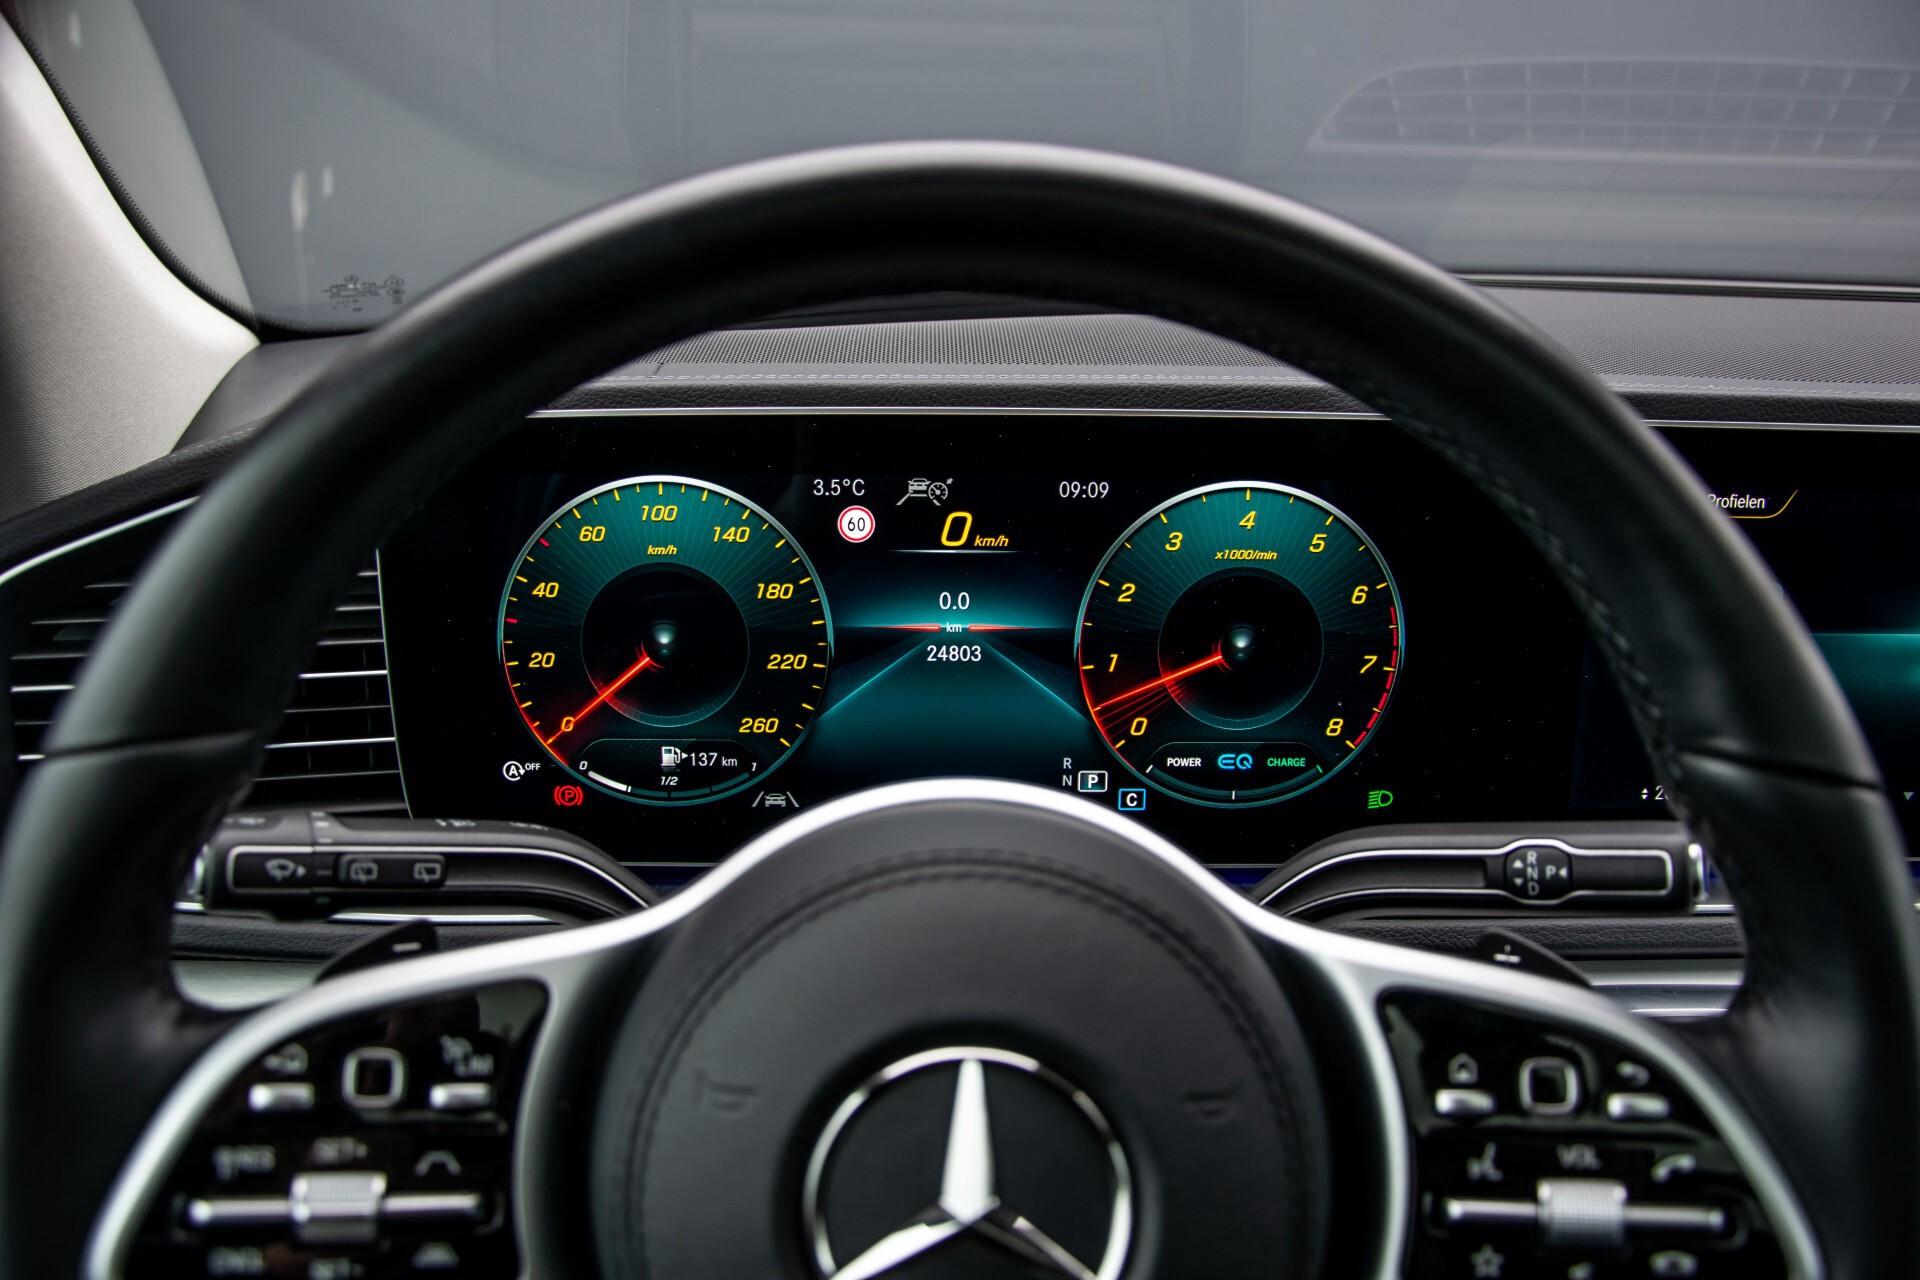 Mercedes-Benz GLE 450 4-M 7-Persoons AMG Massage/Rij-assist/Keyless/TV/360/Night/Trekhaak Aut9 Foto 14